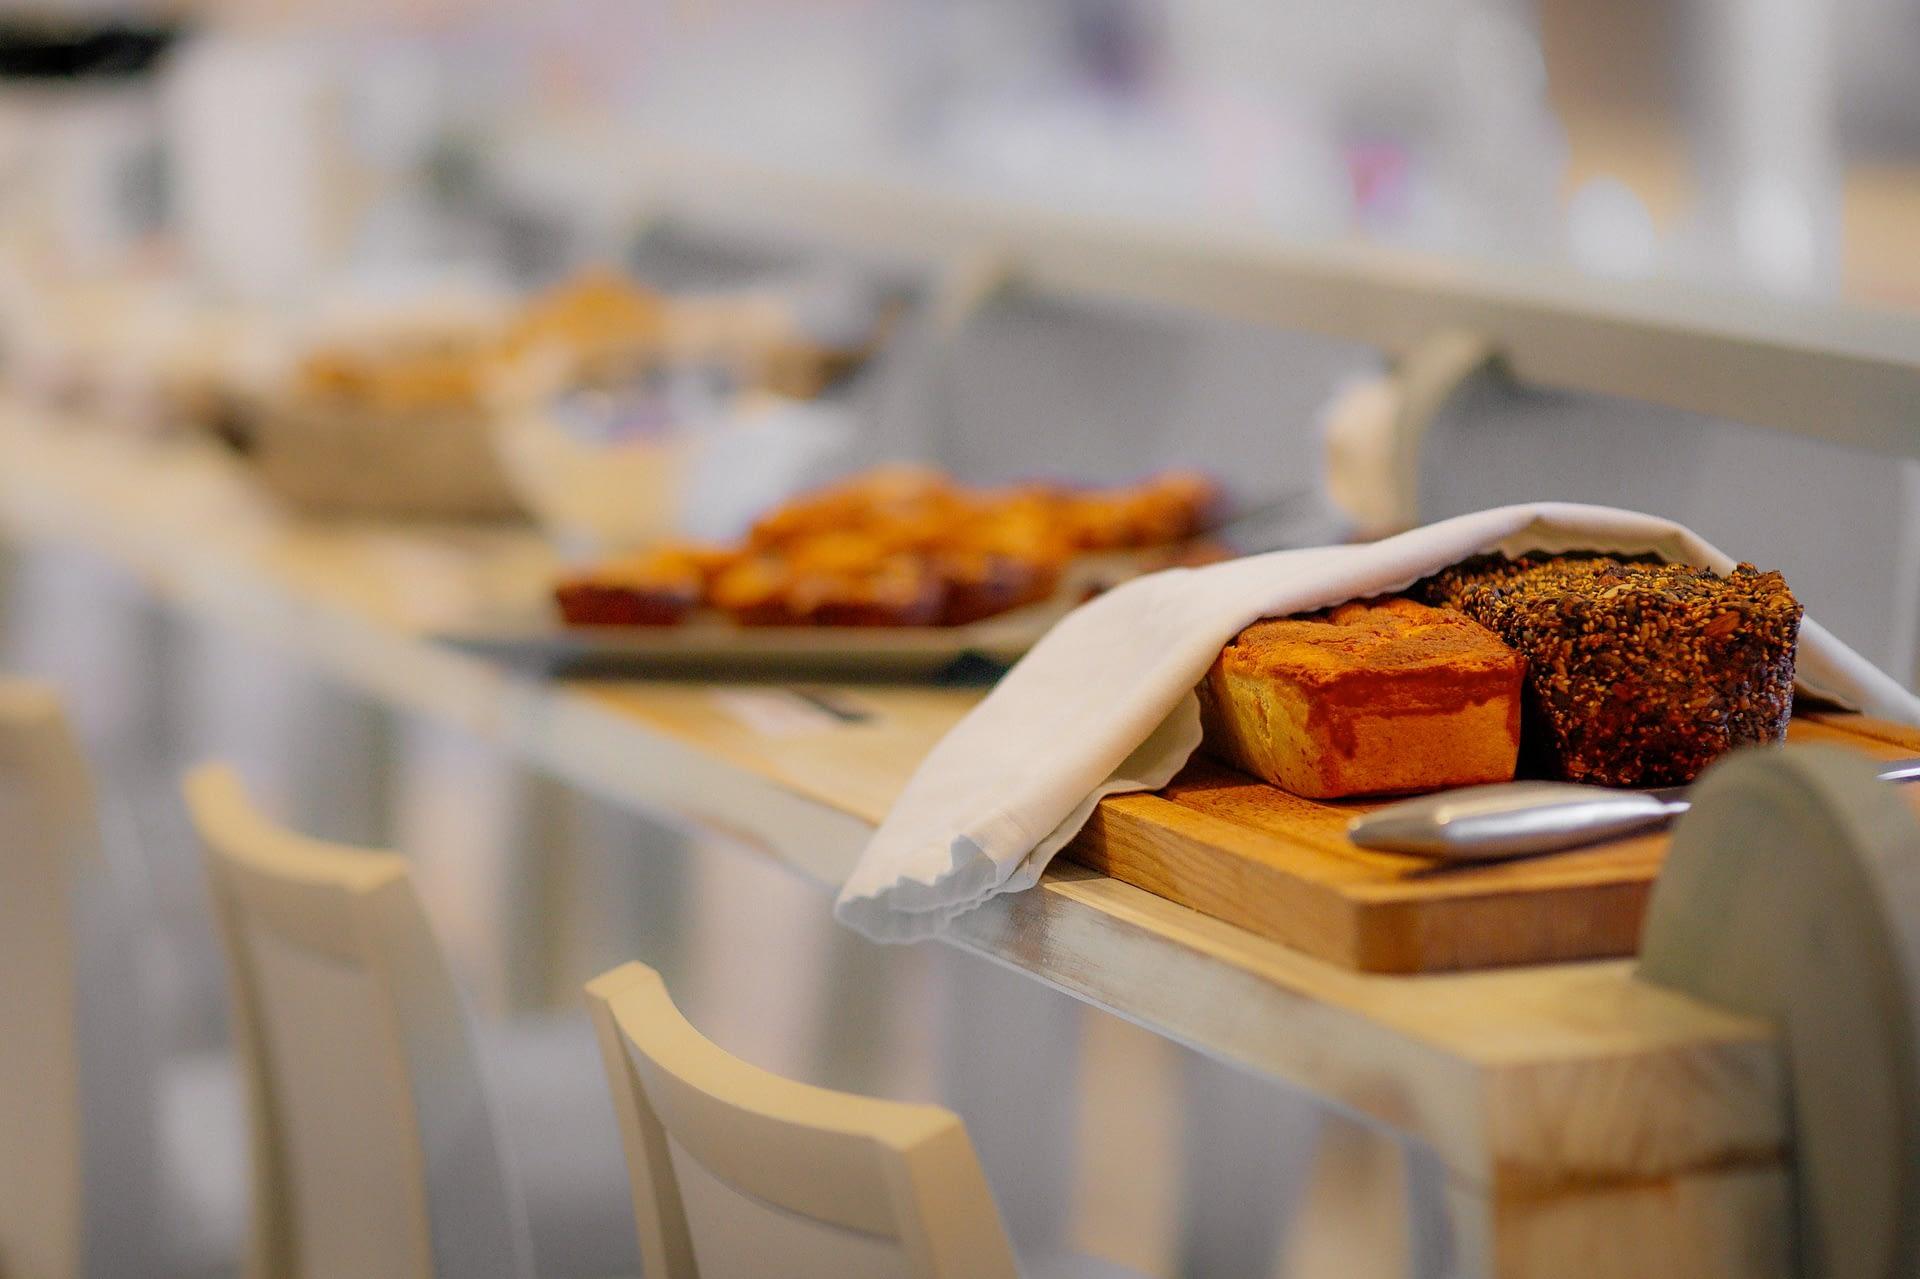 Pierluigi Cavarra - fotografia Productos & food - bread